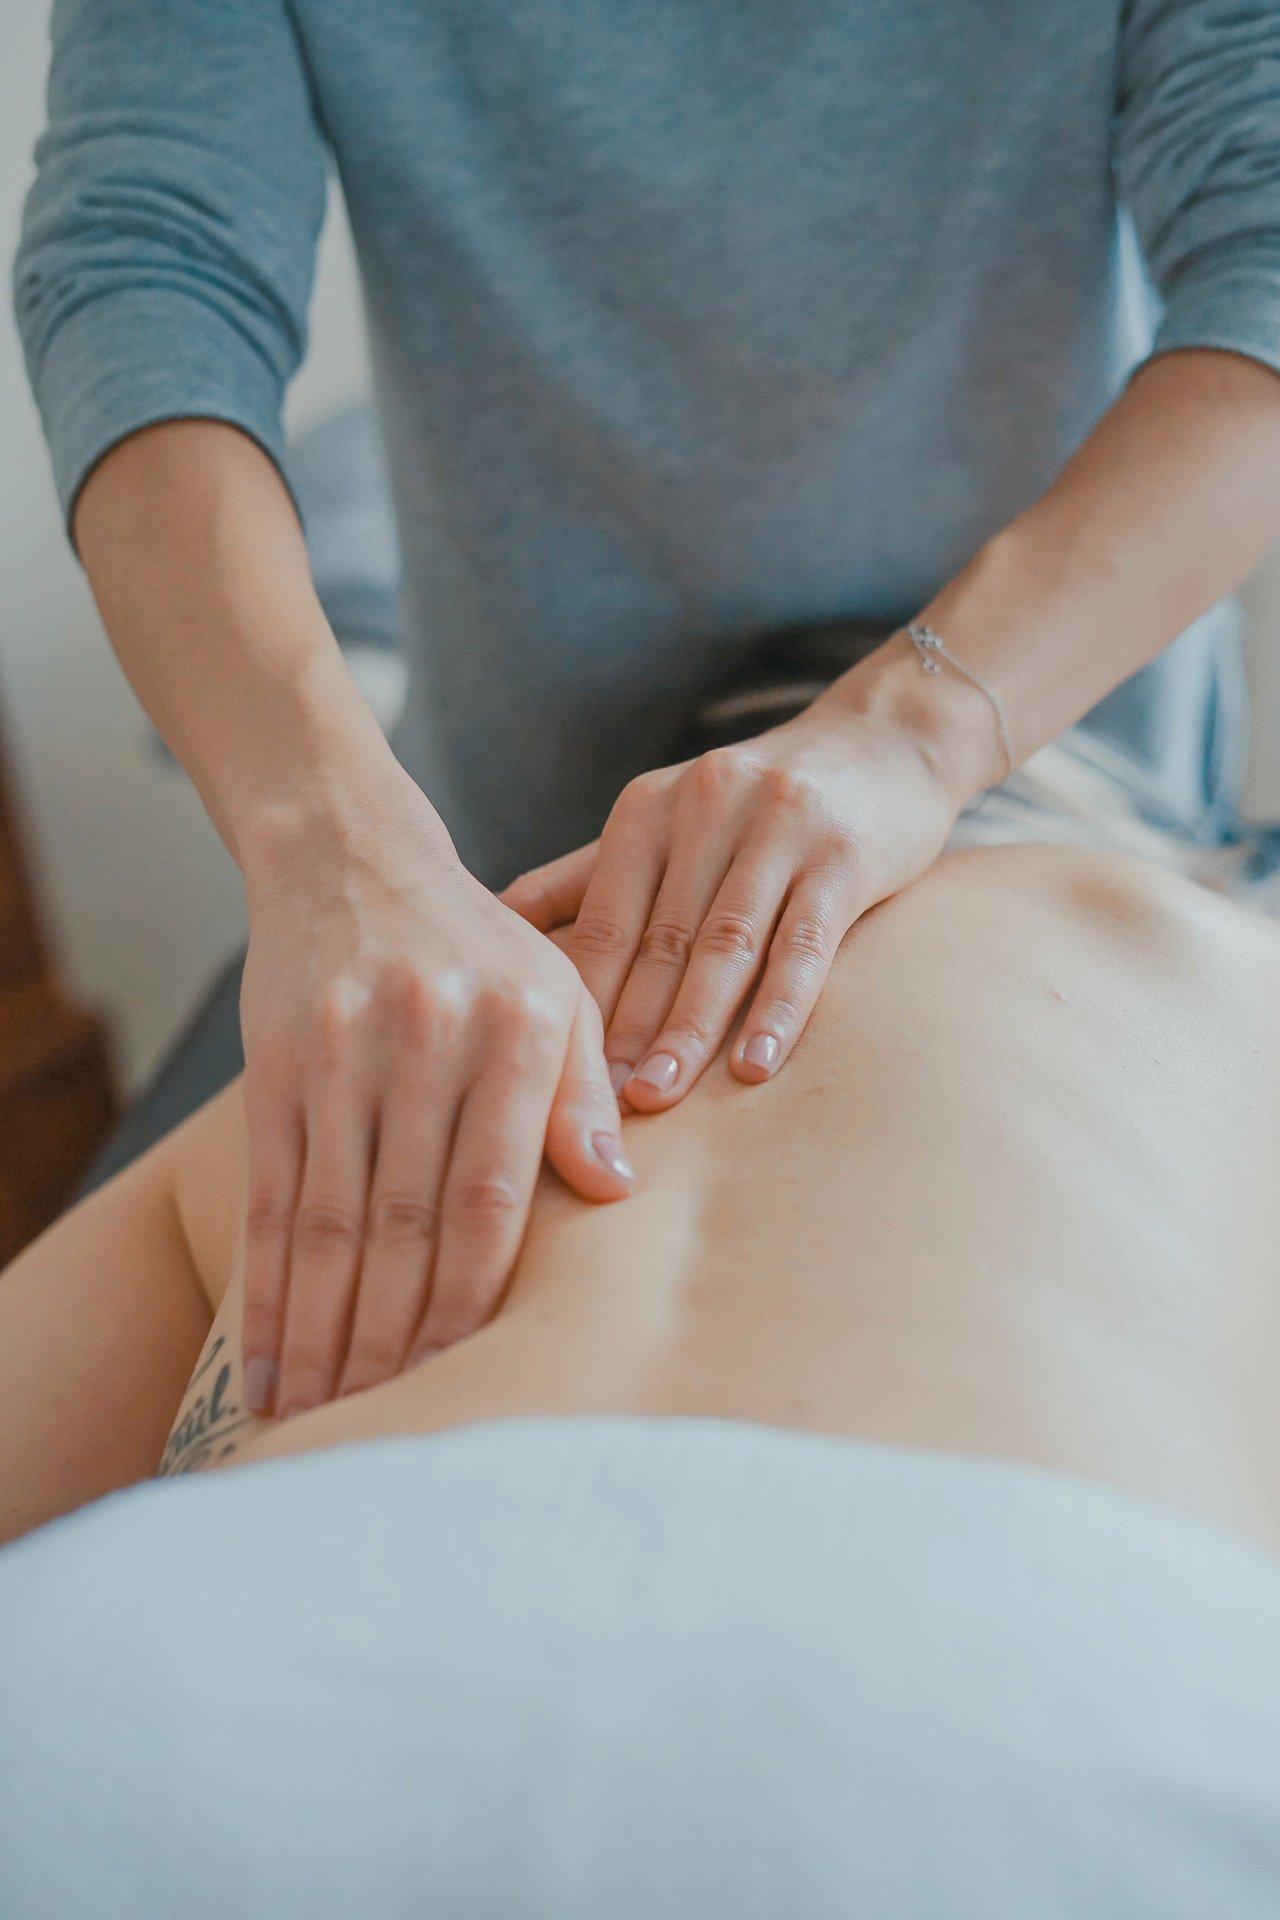 aromatherapy massage using essential oils